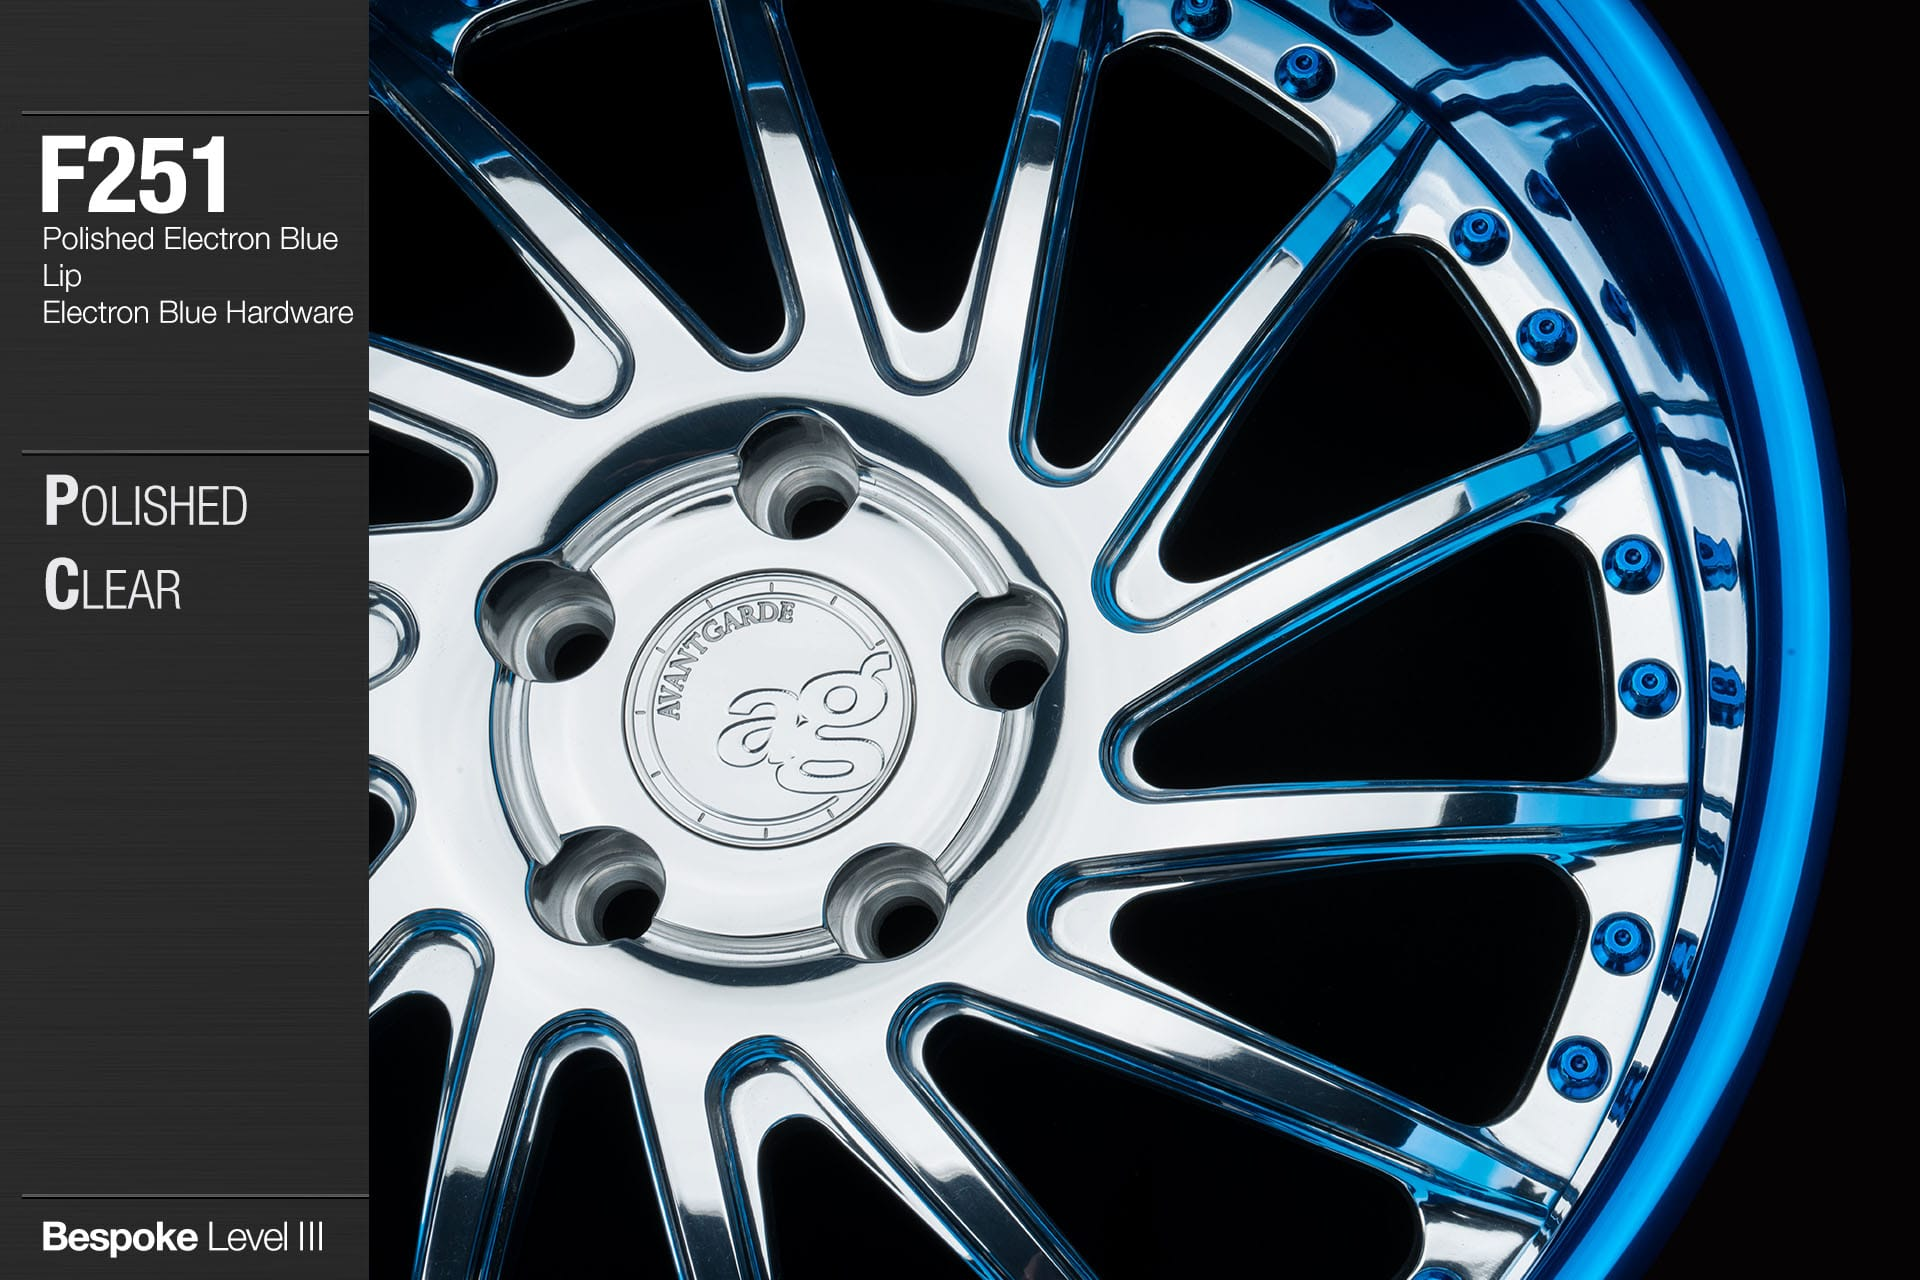 avant-garde-ag-wheels-f251-polished-clear-face-polished-electron-blue-lip-hardware-2-min